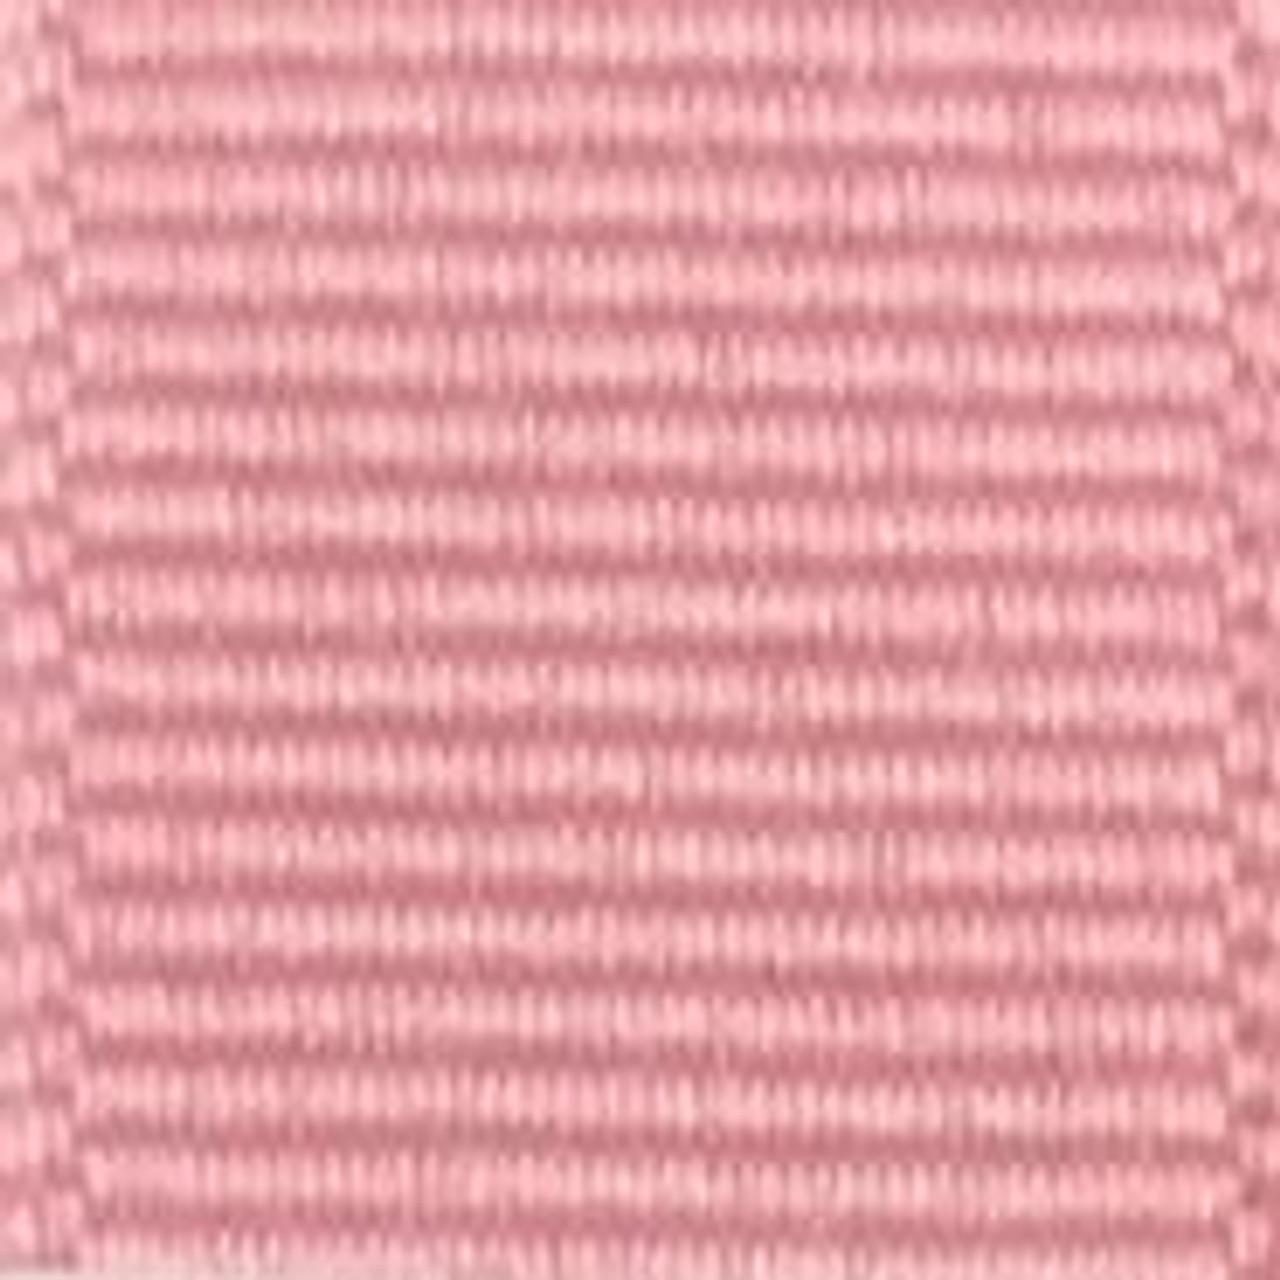 Pink Solid Grosgrain Ribbon